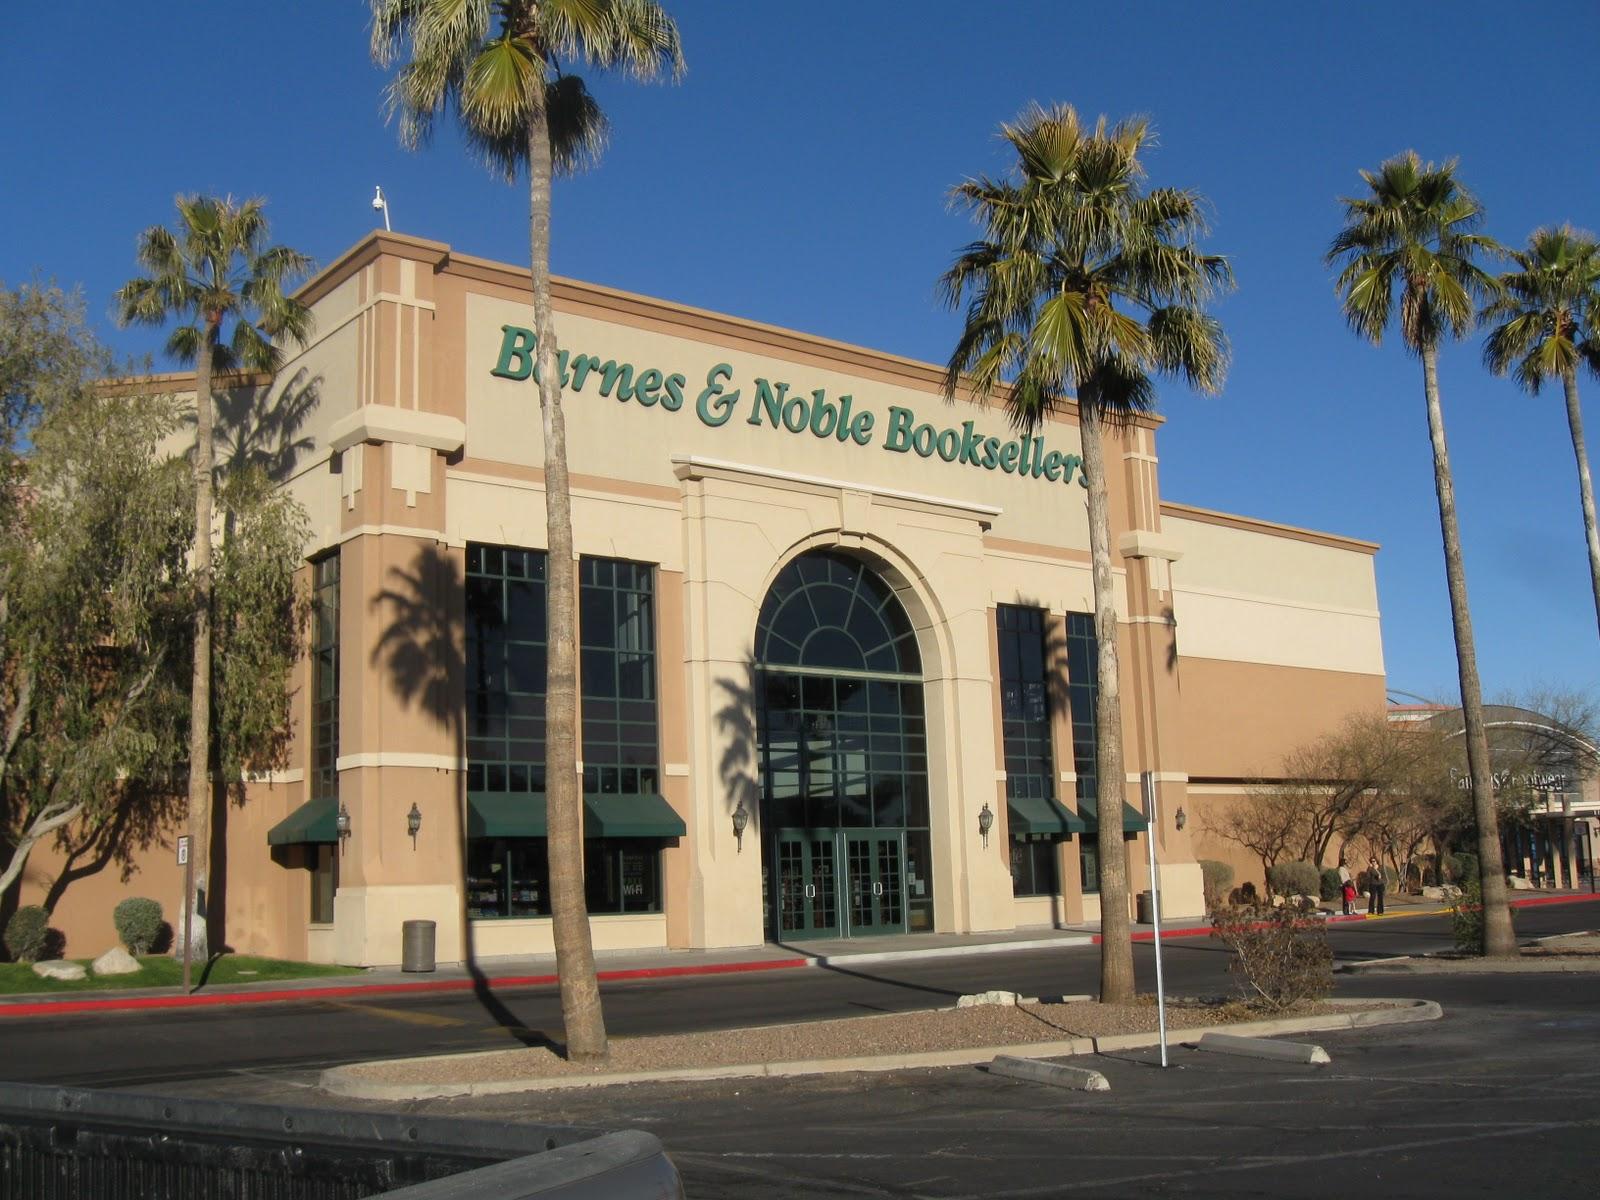 Kimberly S Journey Barnes Amp Noble